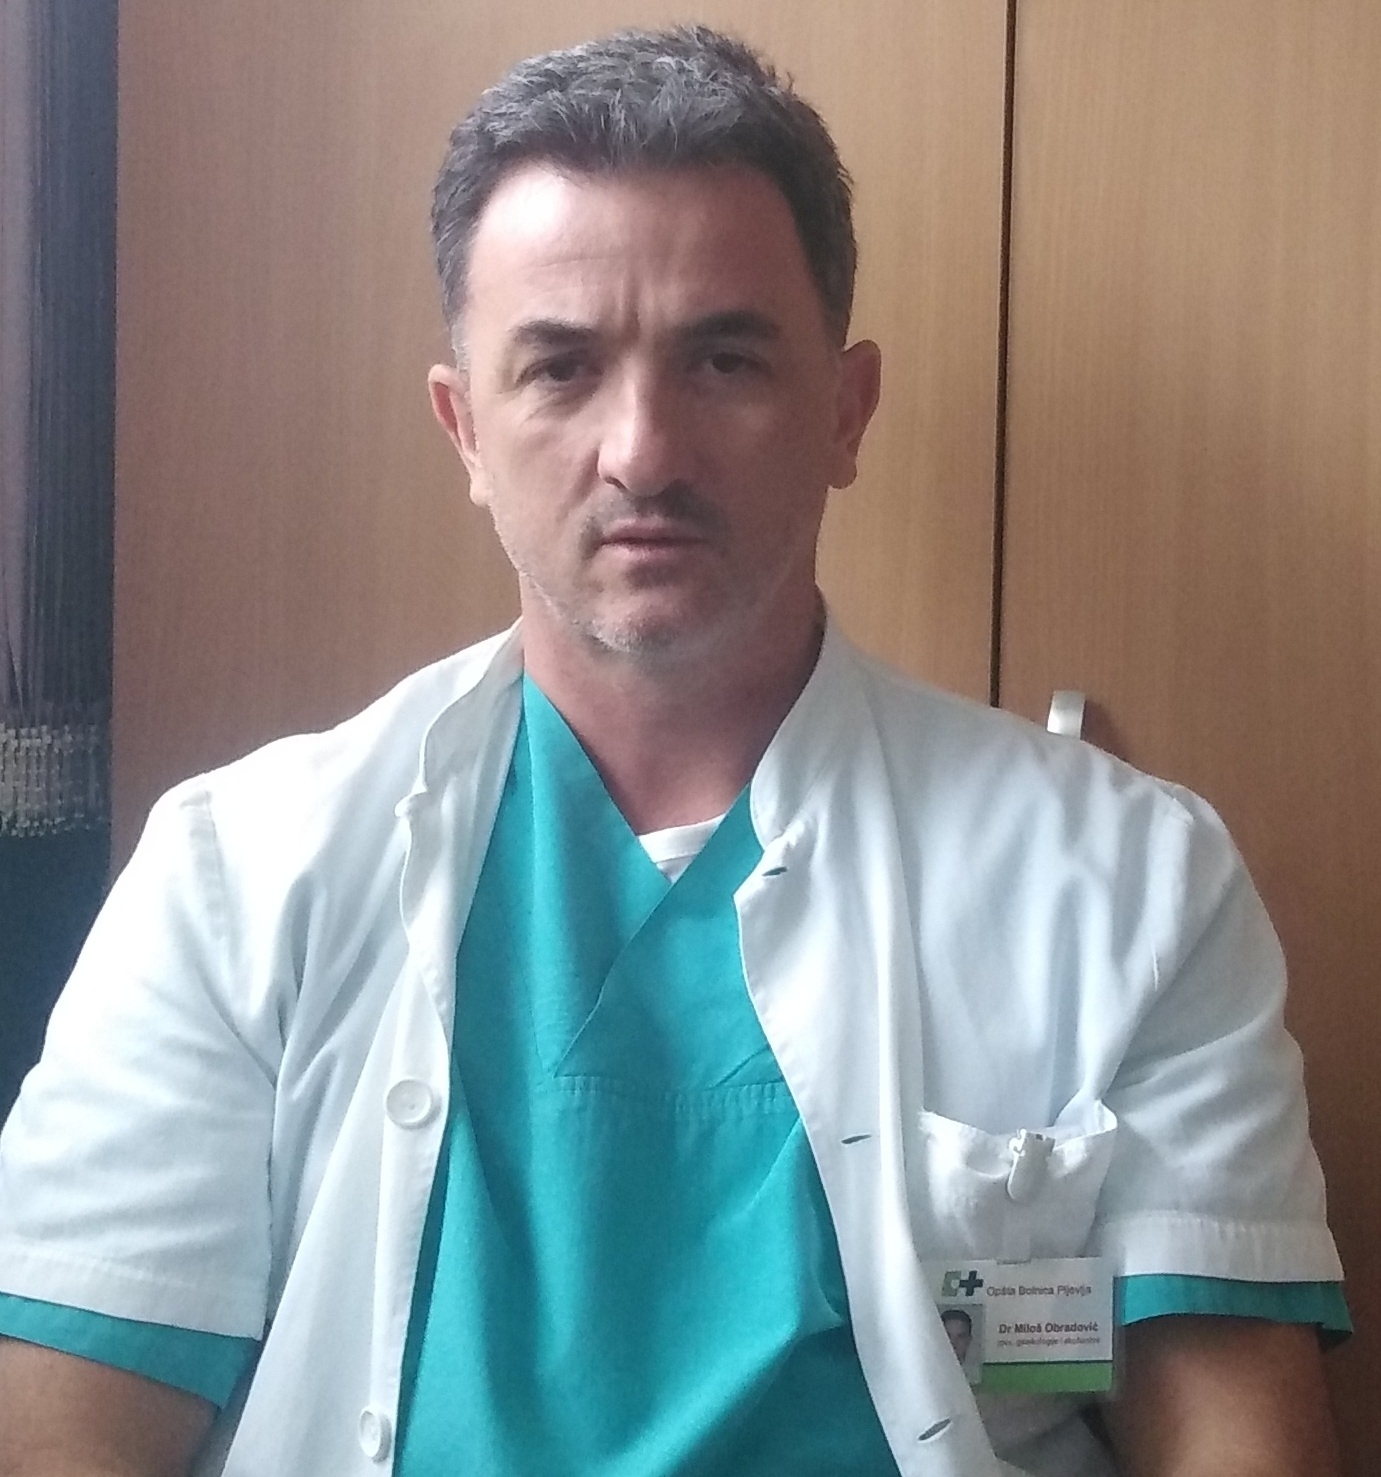 Milos Obradovic